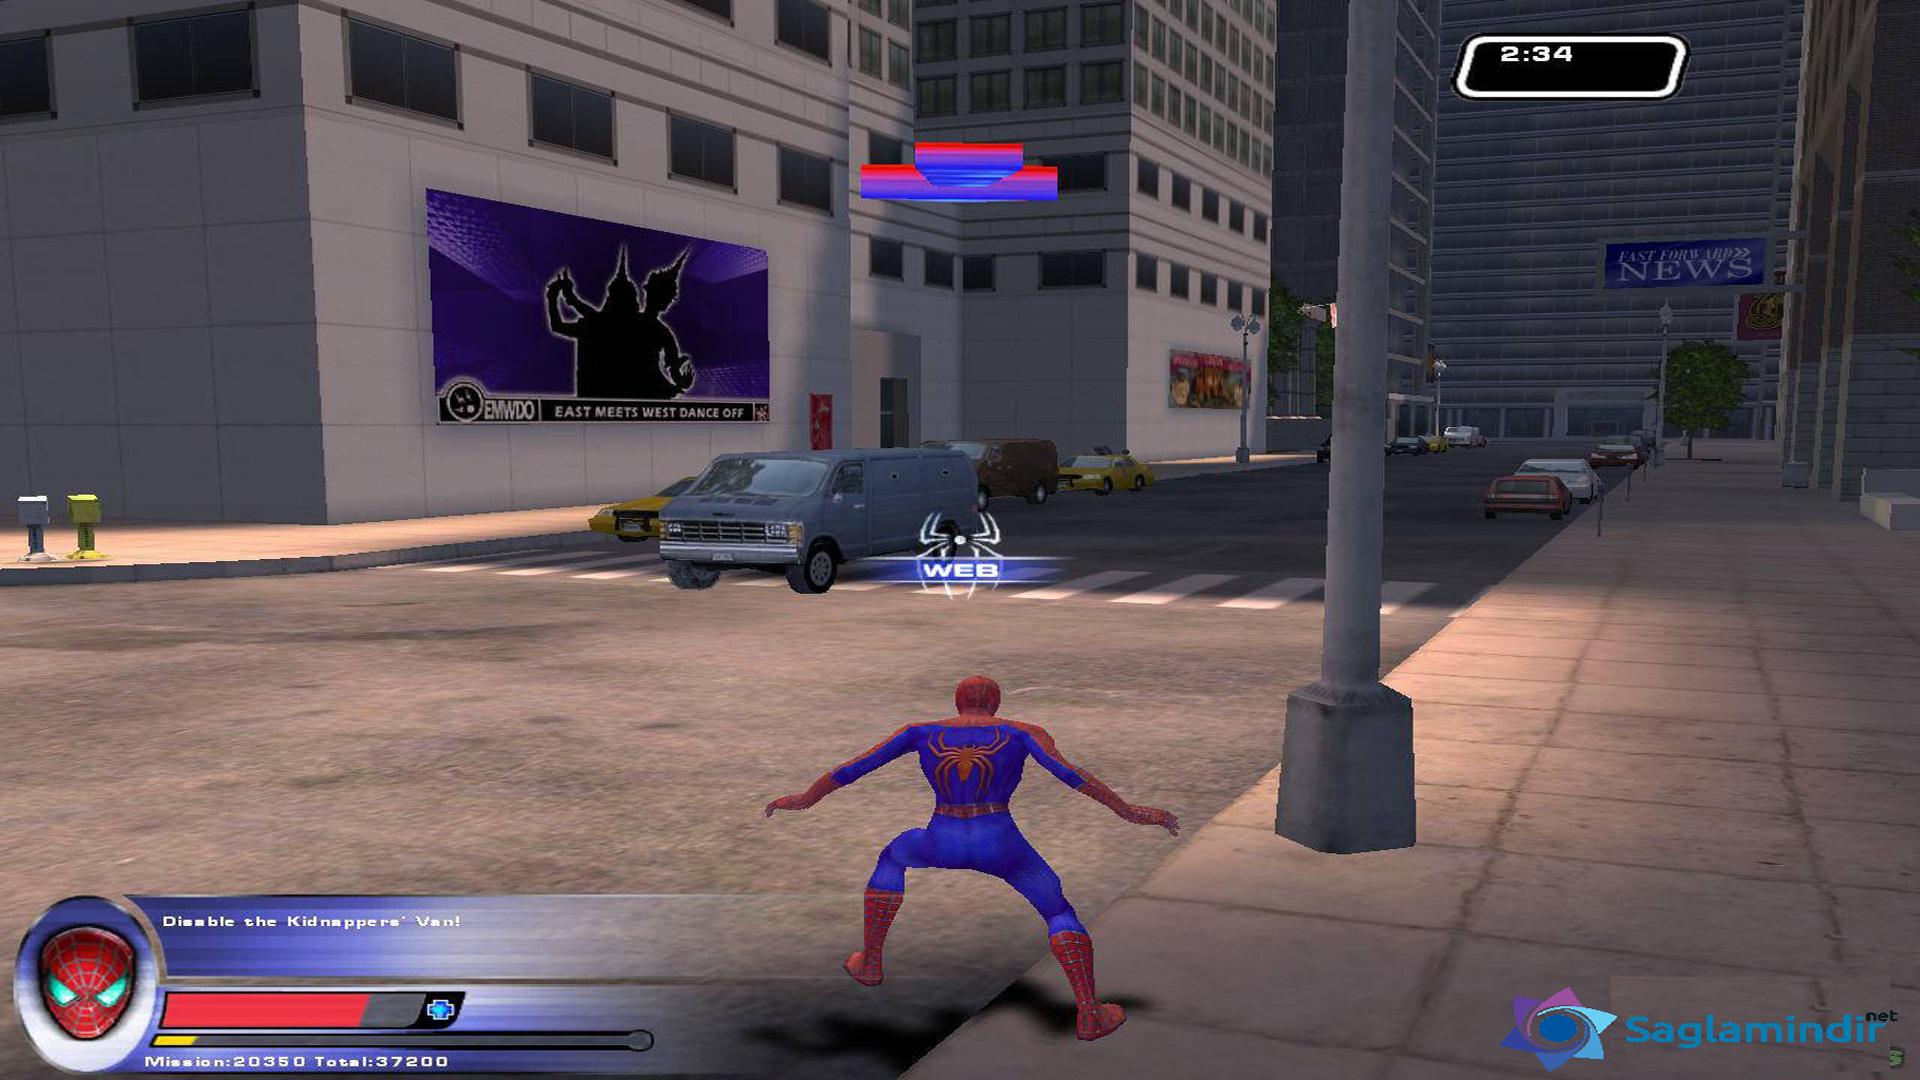 Spider Man 2 The Game saglamindir